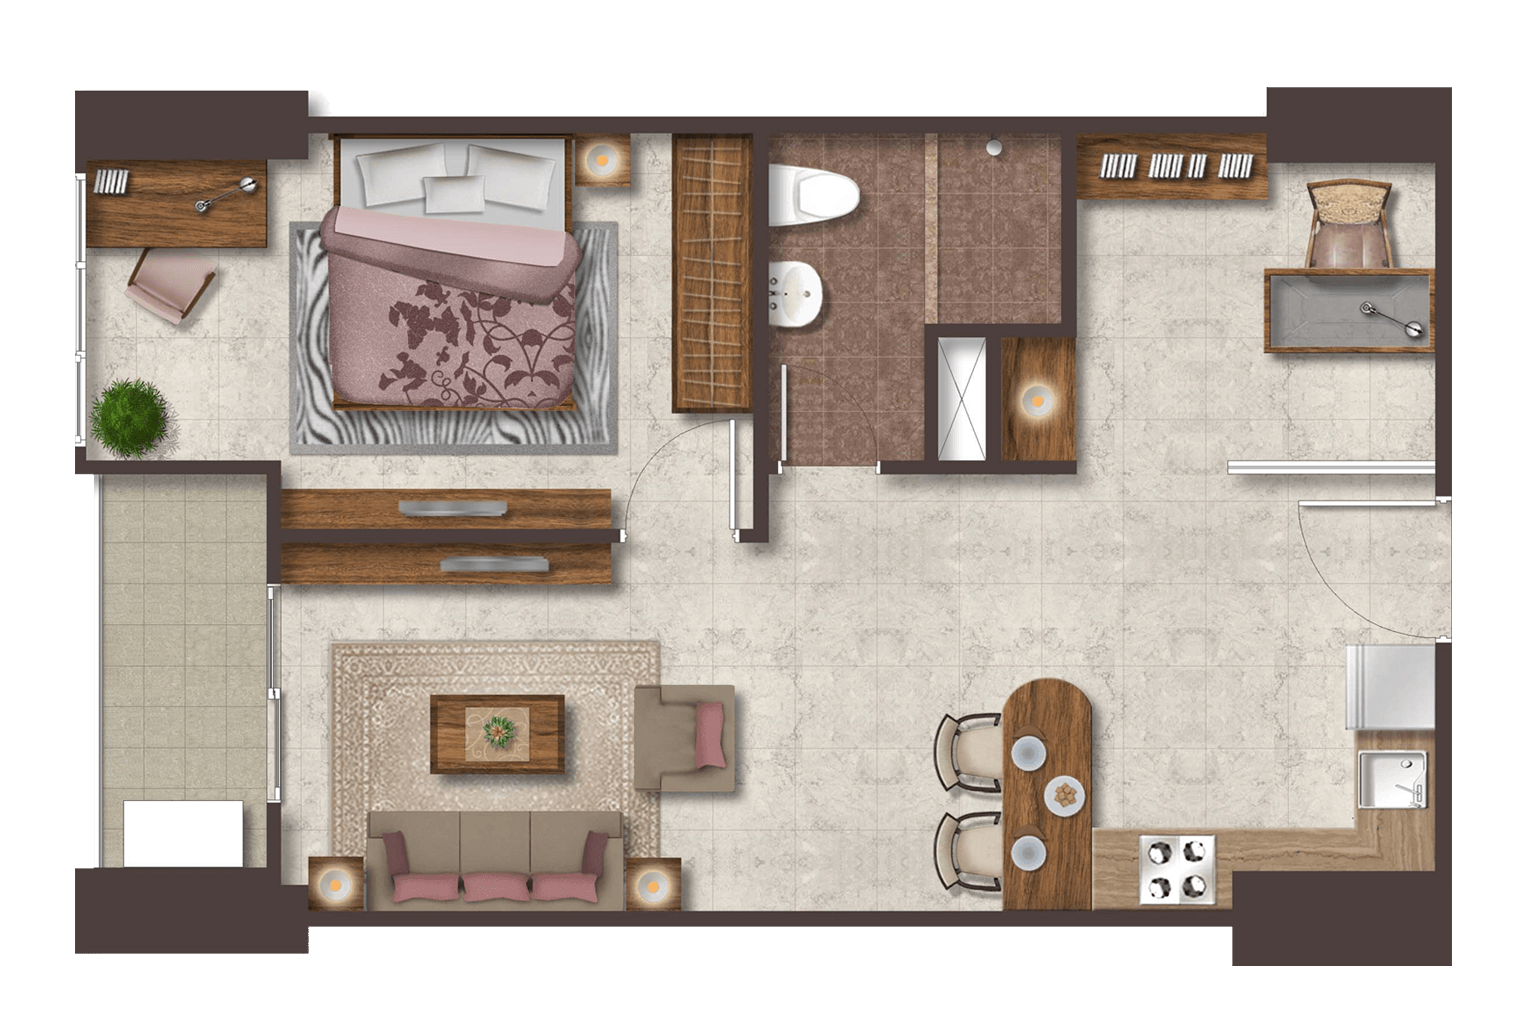 Podomoro City Deli Medan Luxurious Deluxe 1+1 bedroom